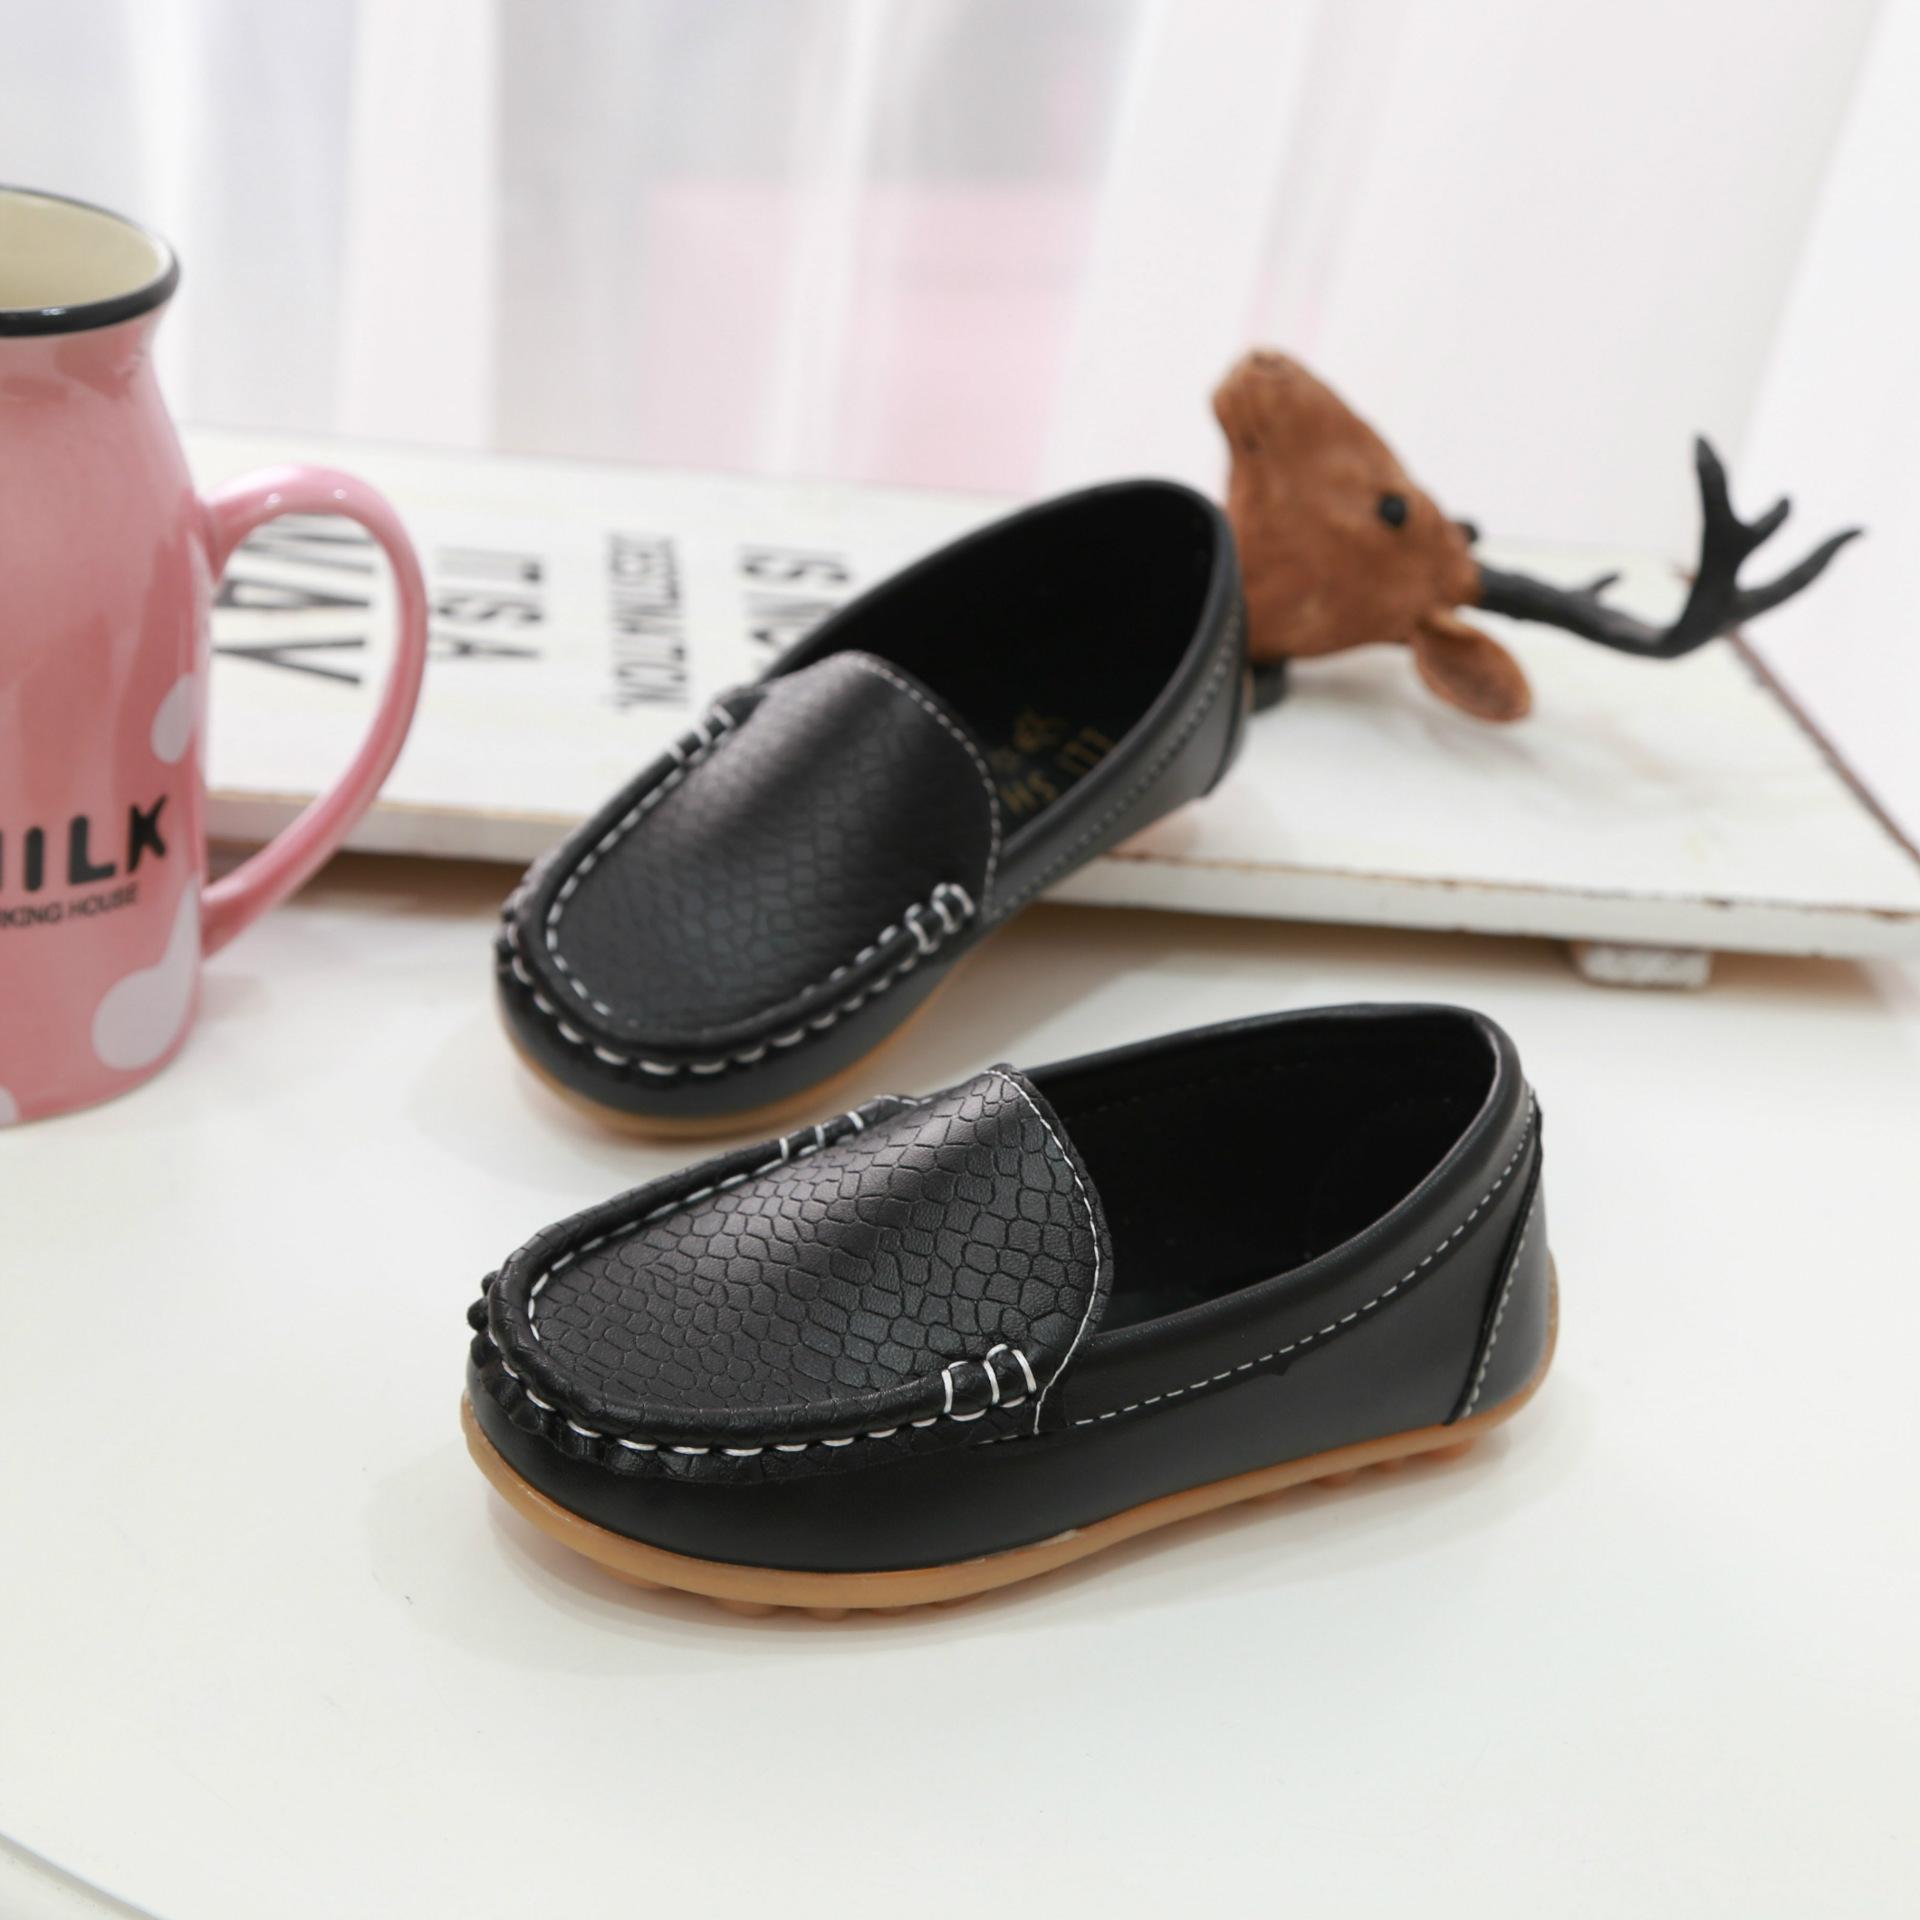 Kids Girls Shoes Peas Soft Bottoms Moccasins Tide Children\'s Comfortable Flats